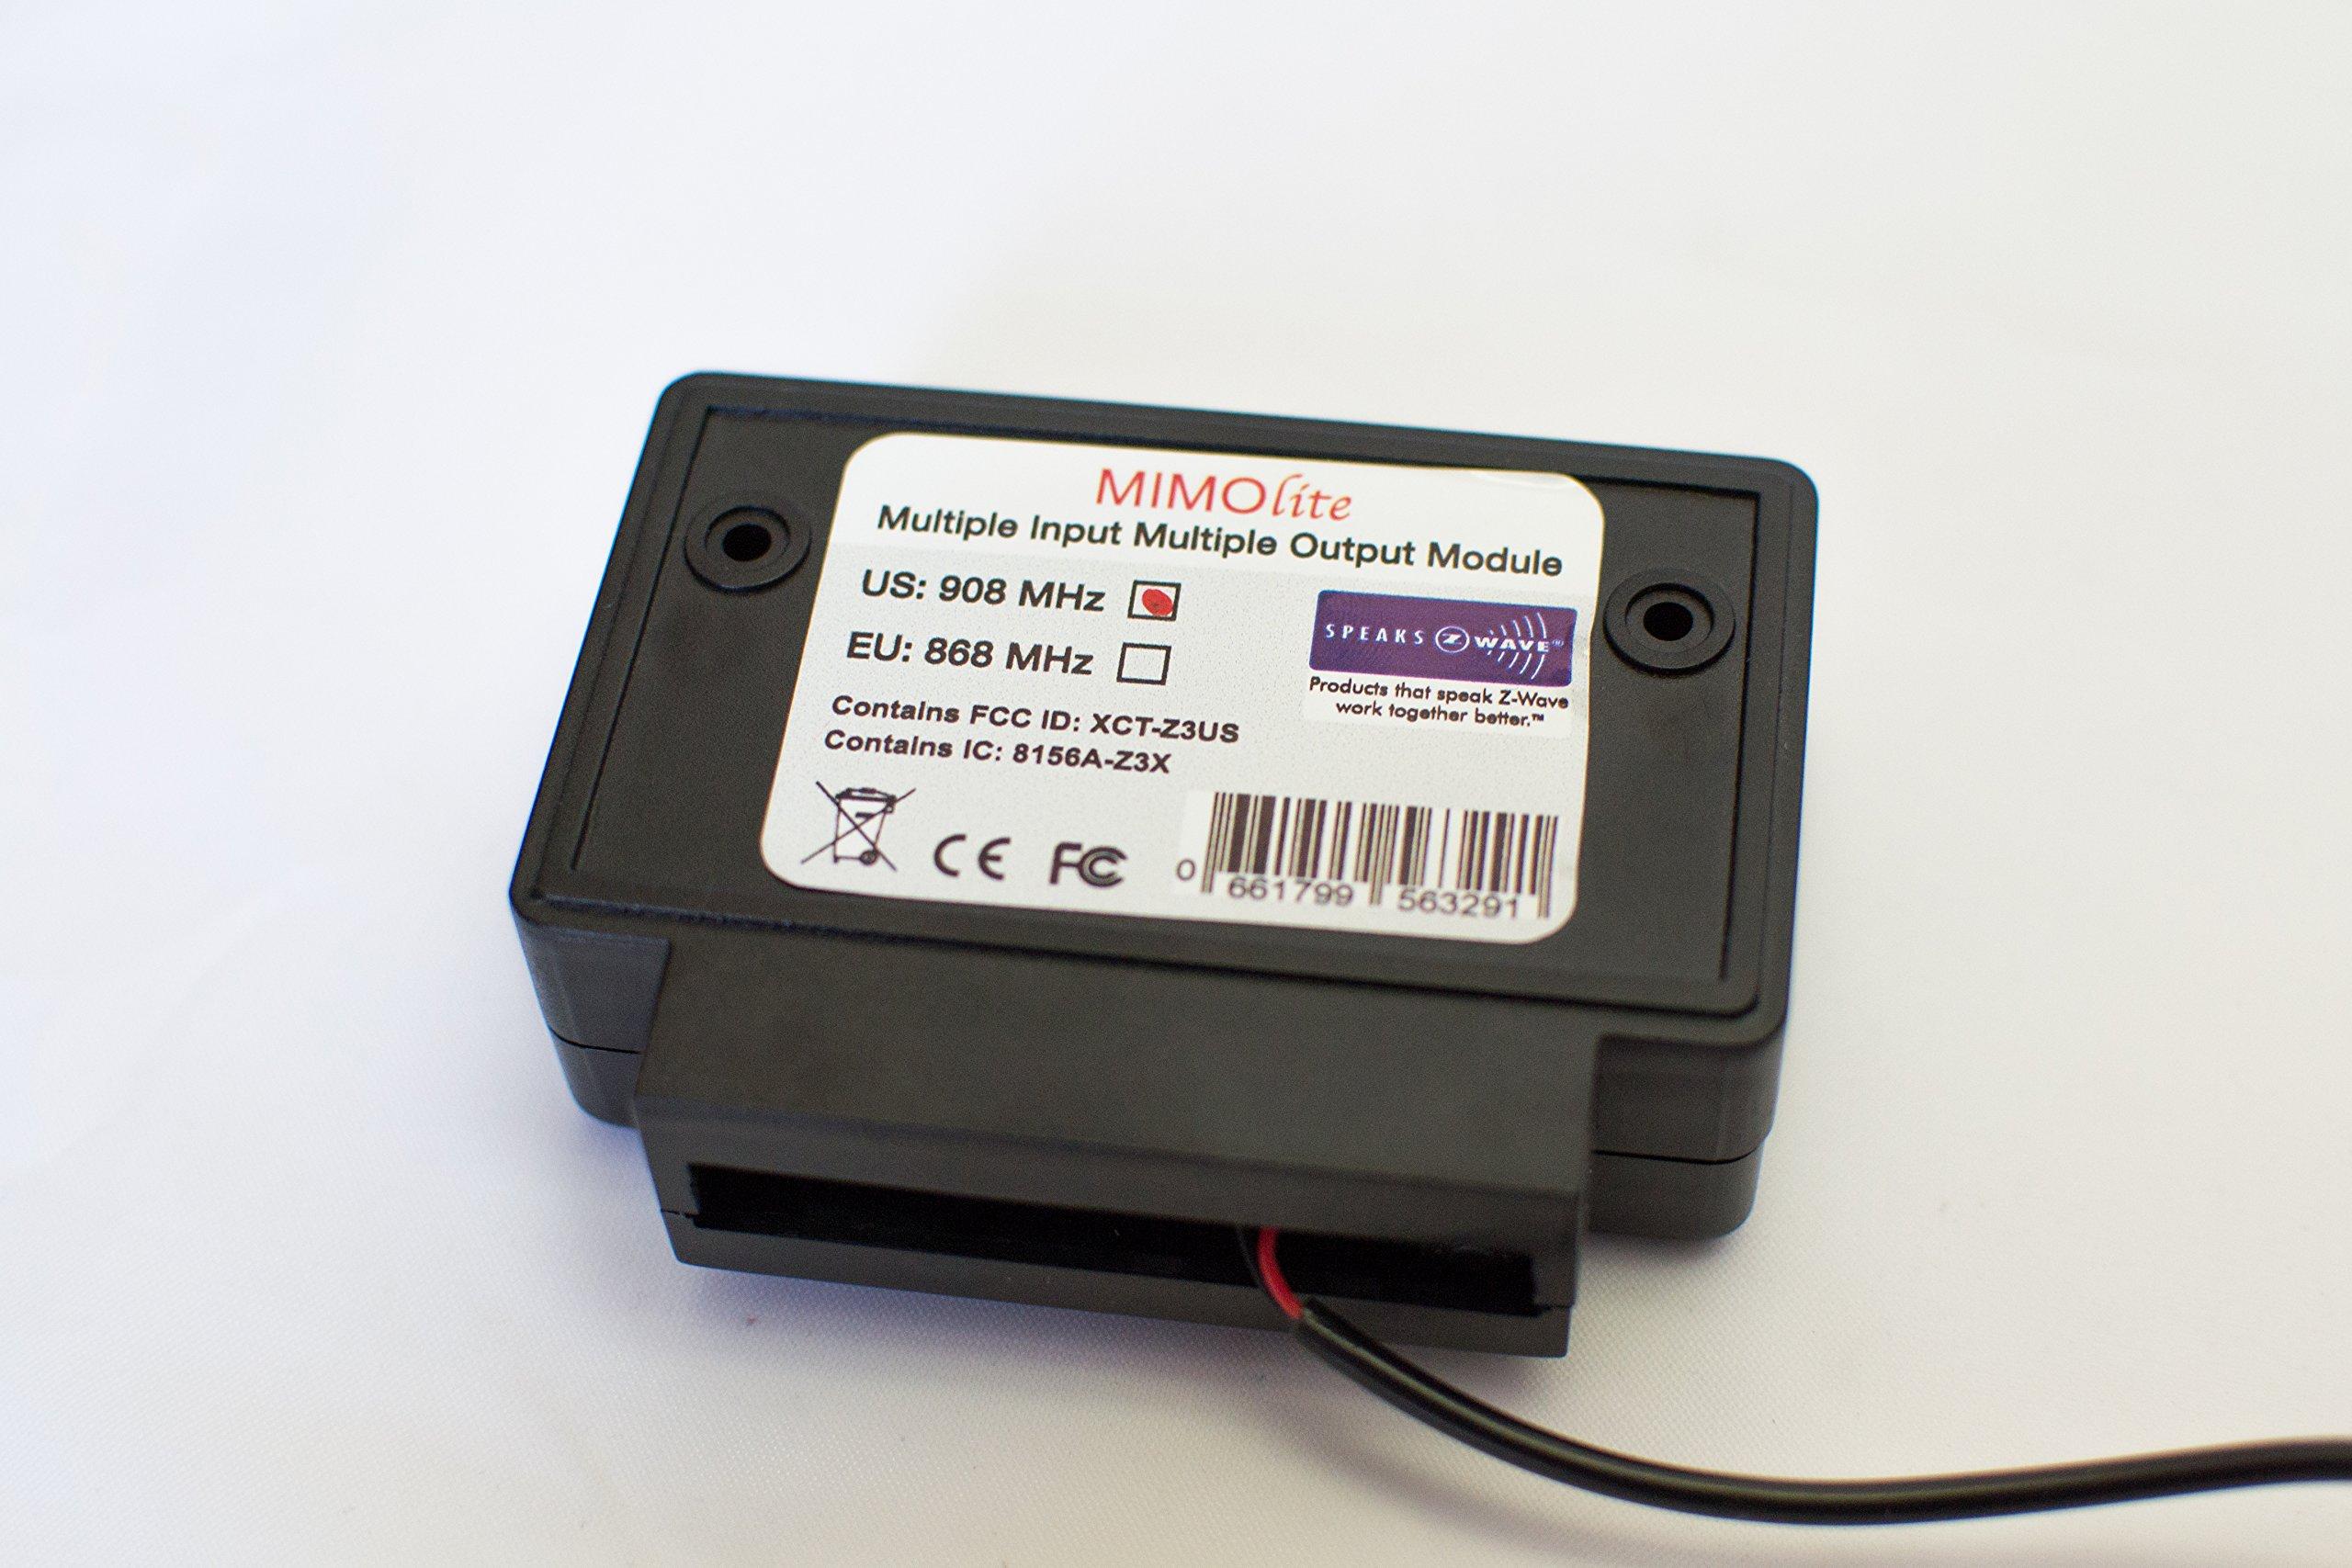 Wireless Z Wave Multi Input Output Dry Contact Bridge Cert Id Block Diagram Zc08 16040002 Fortrezz Mimoliteus